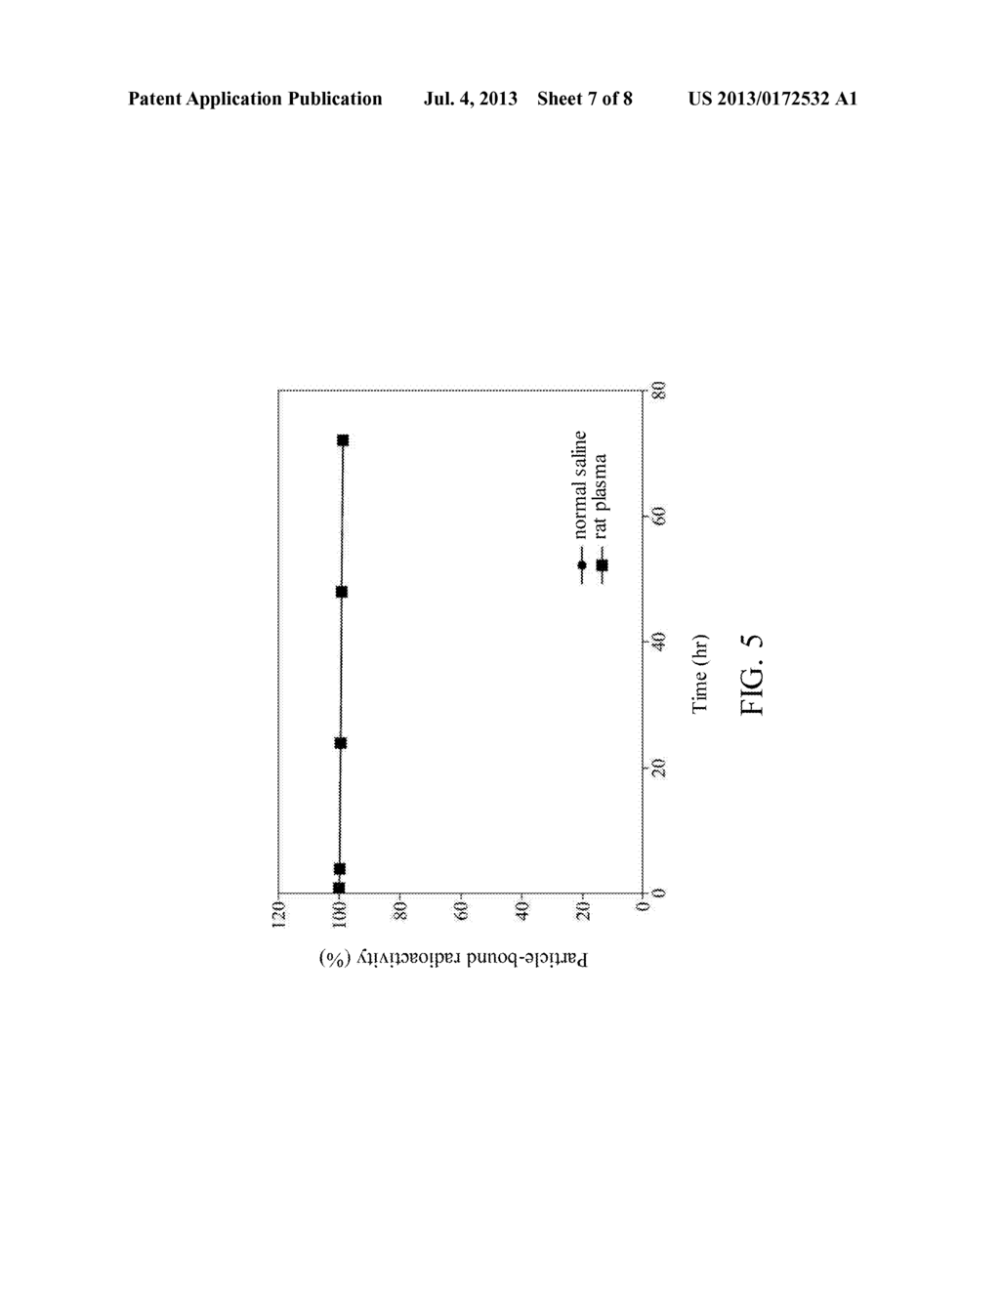 medium resolution of method for making rhenium 186 188 labeled human serum albumin microspheres and kit for making the same and method for using the kit diagram schematic